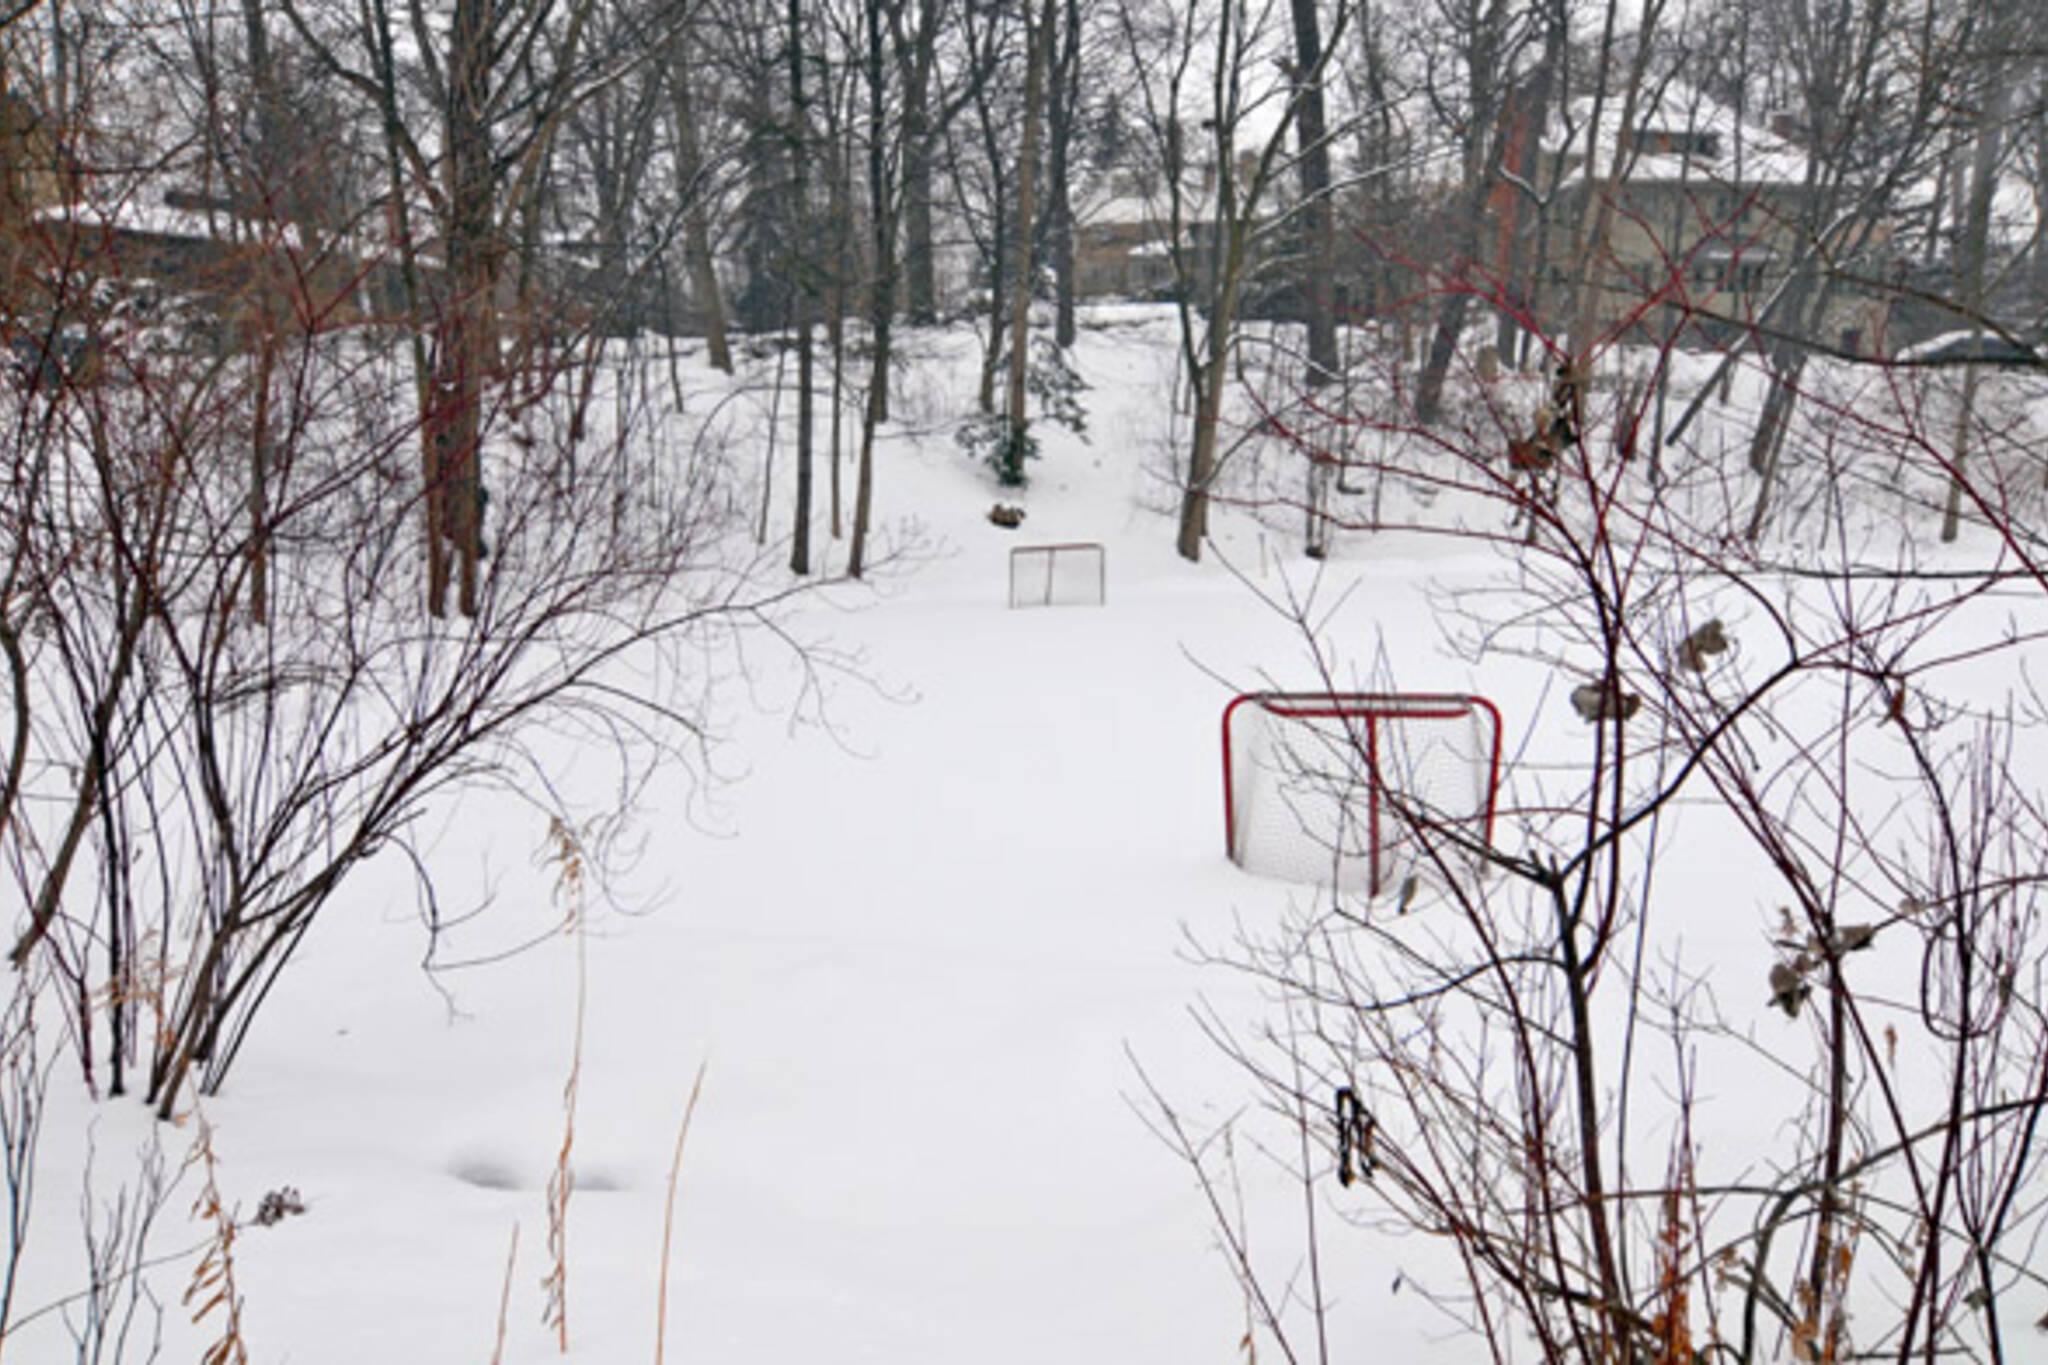 Wychwood Park Ice Rink